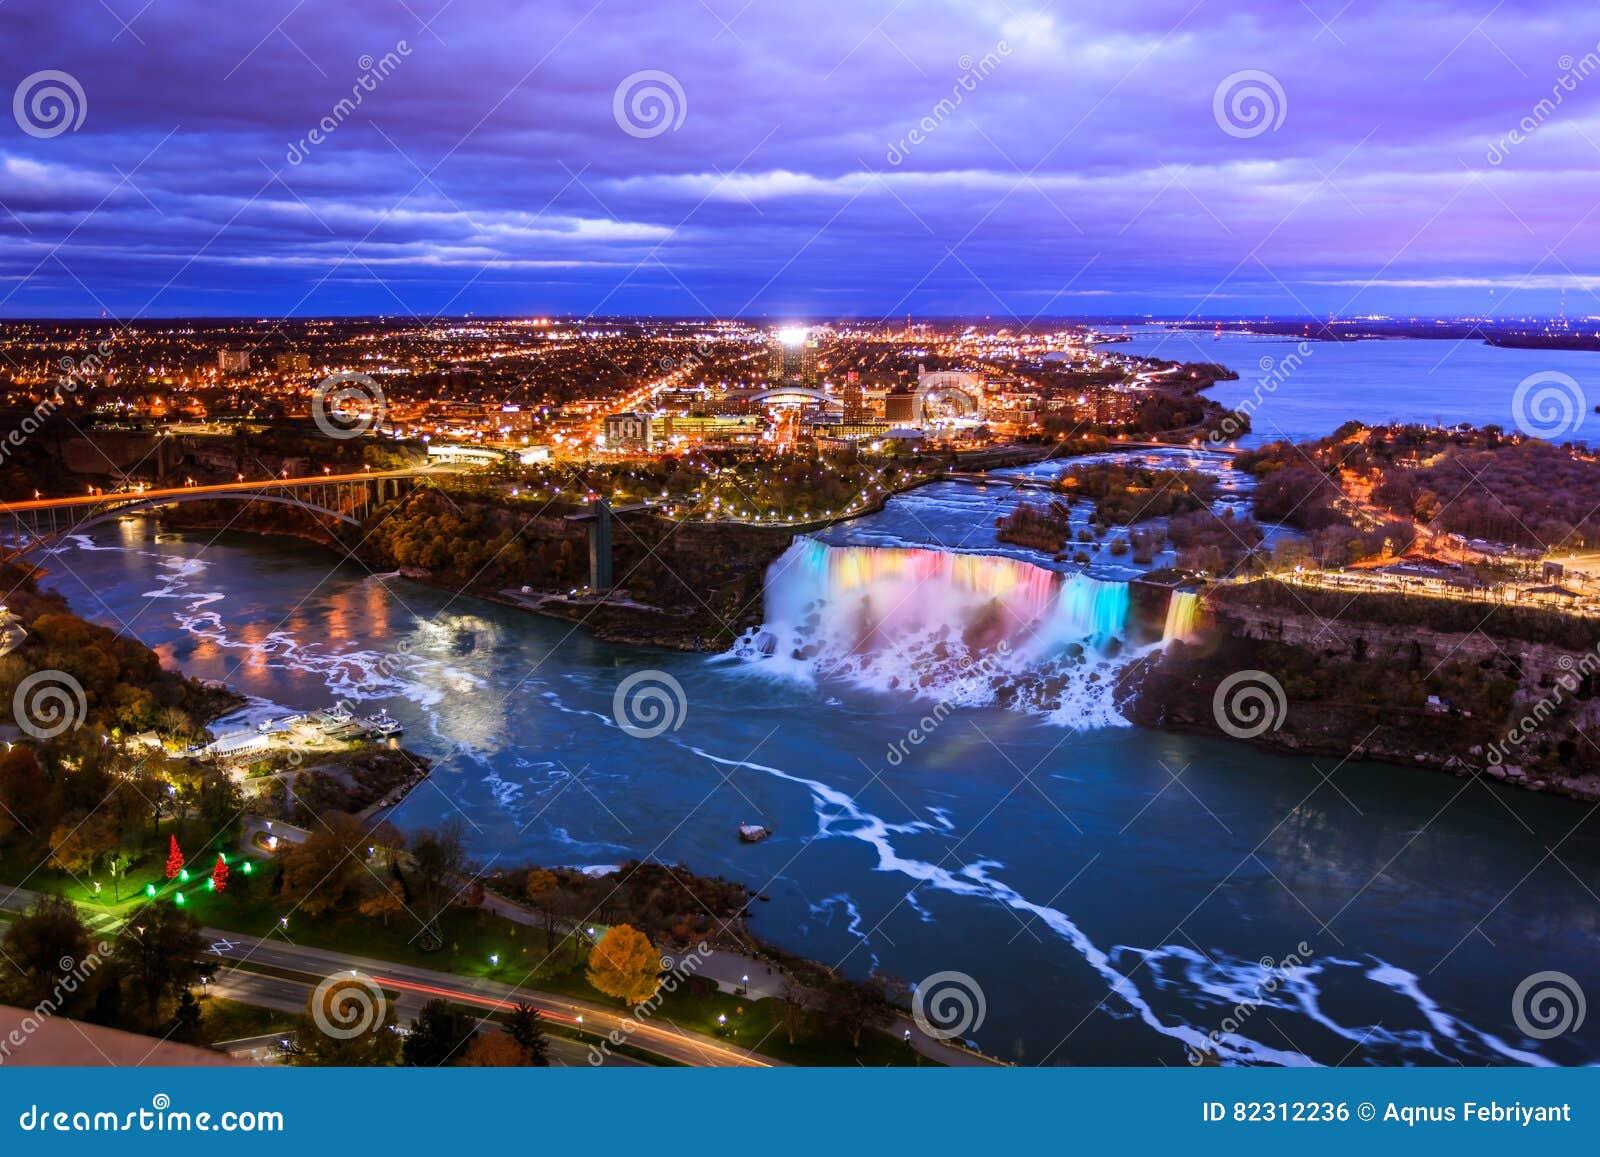 Bird View of Niagara Falls